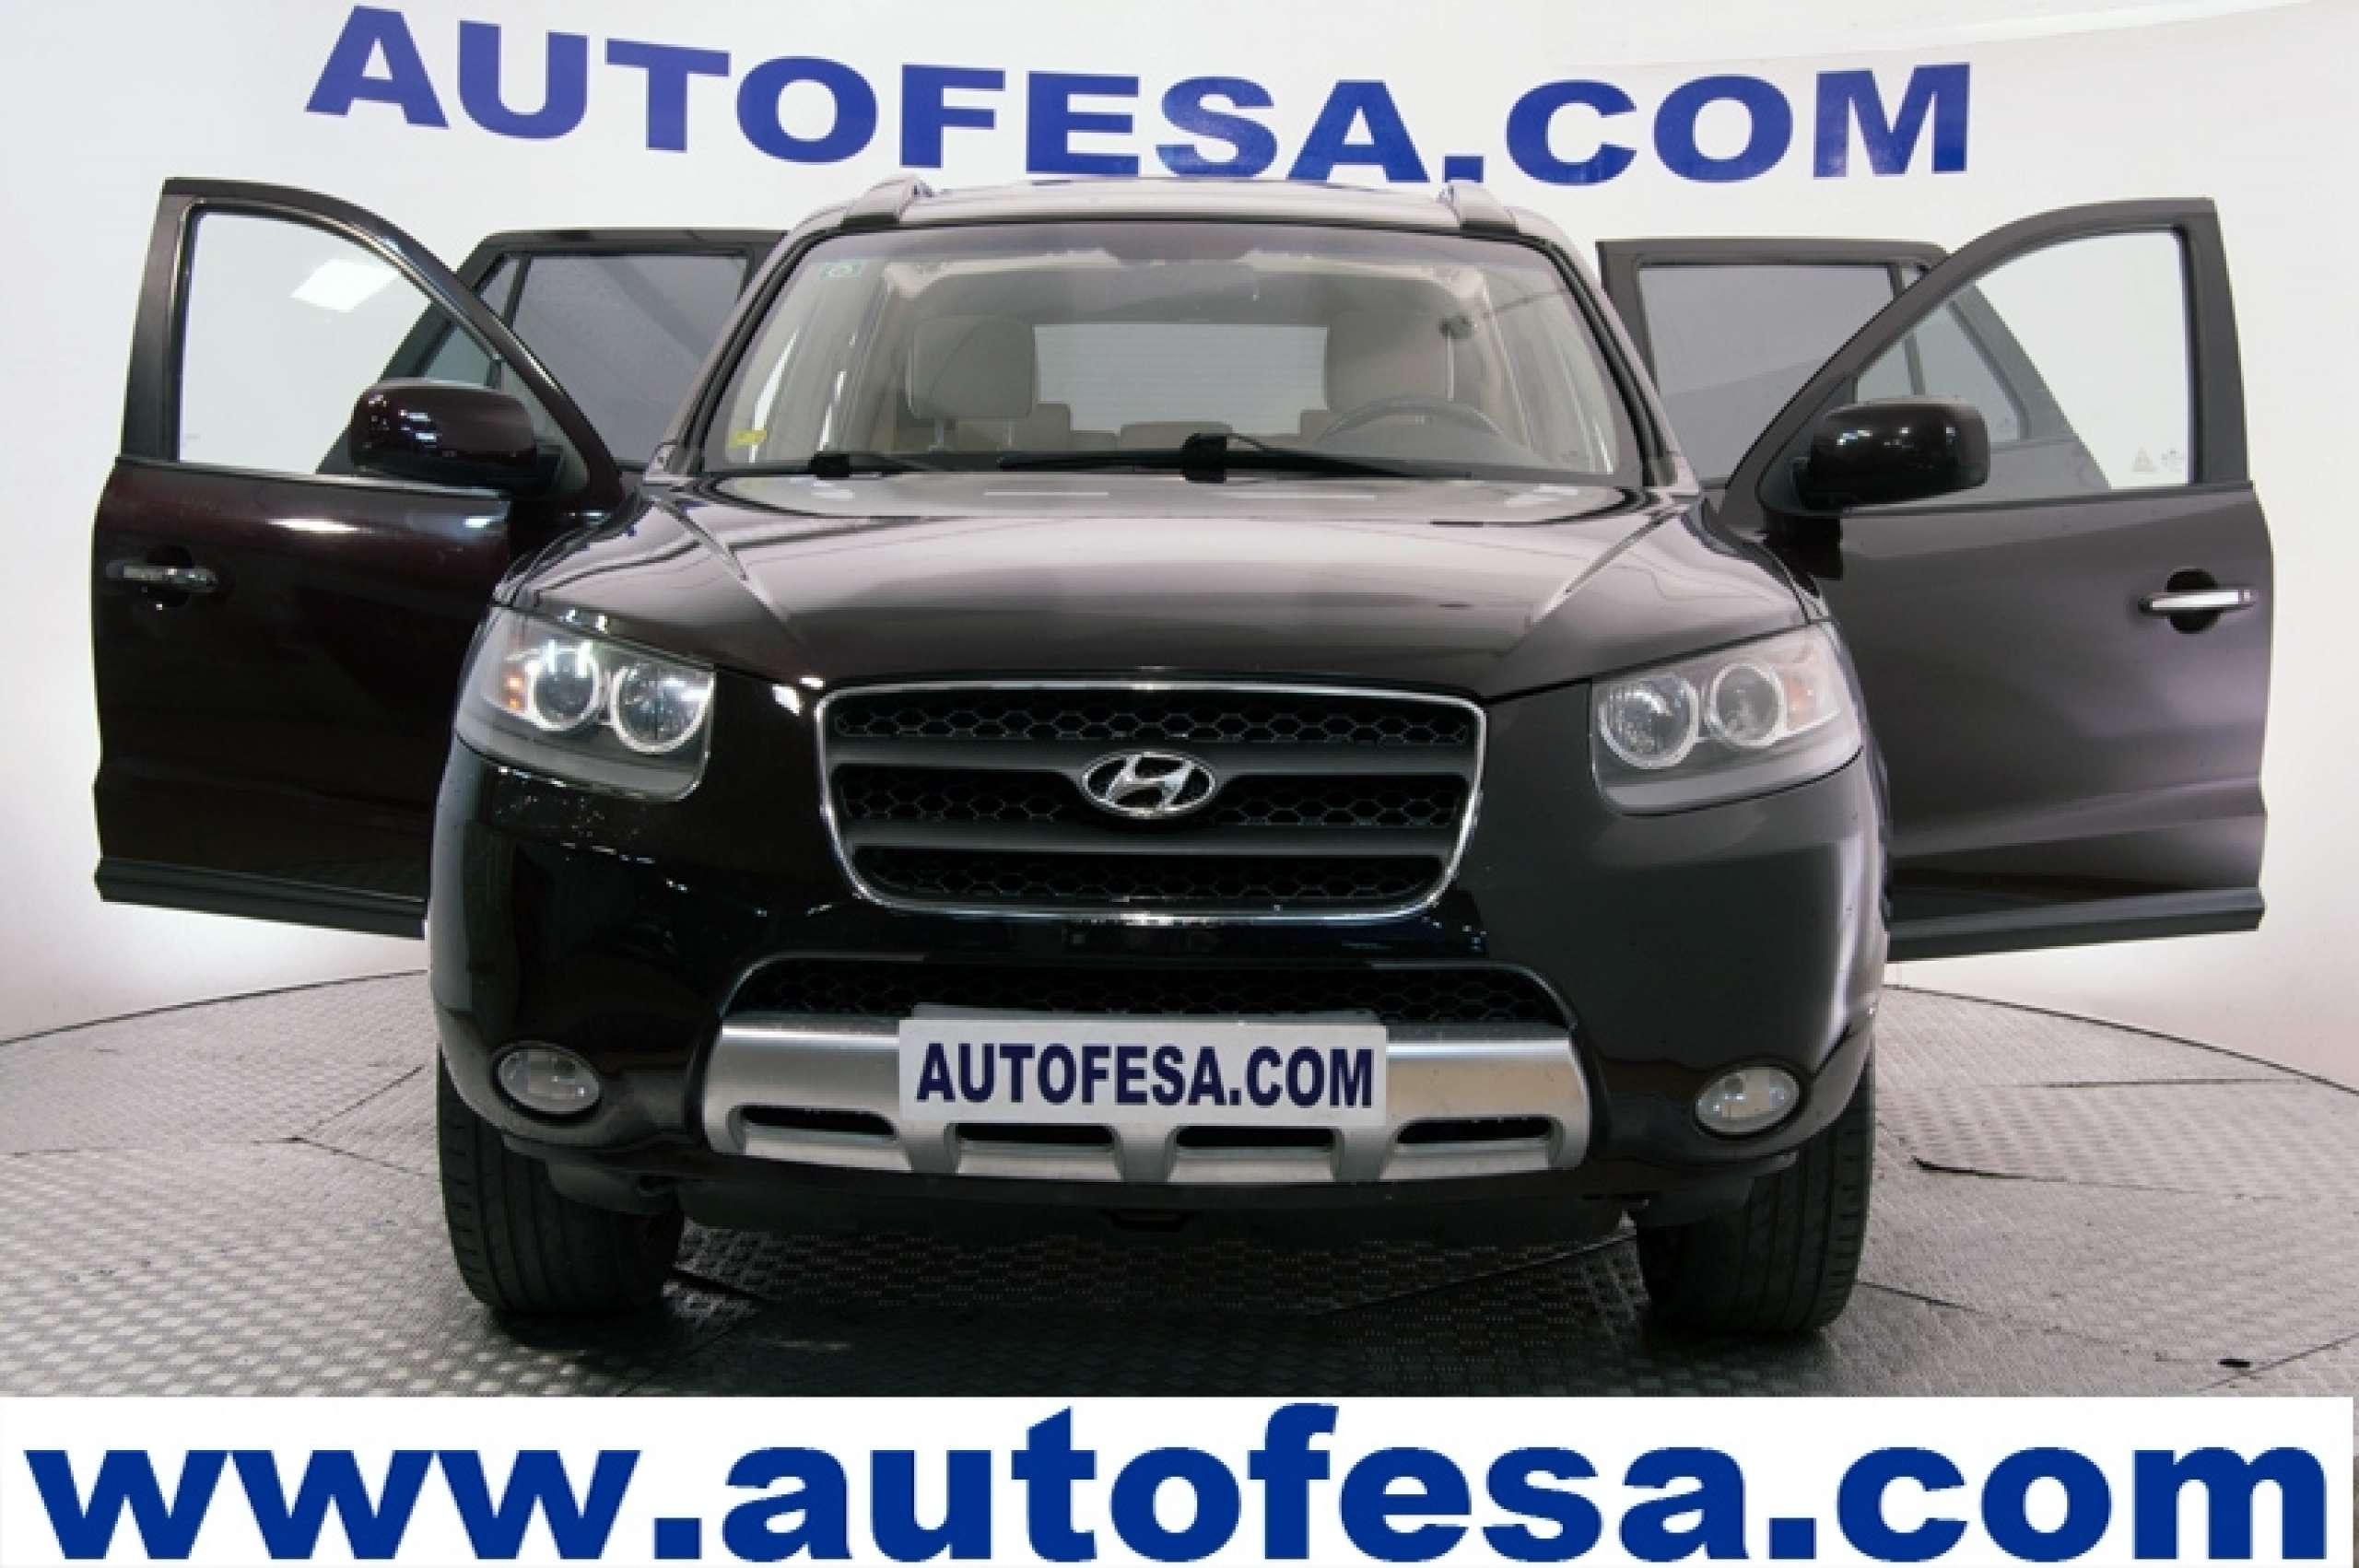 Hyundai Santa Fe 2.2 CRDI 155cv Style Auto 5p - Foto 11